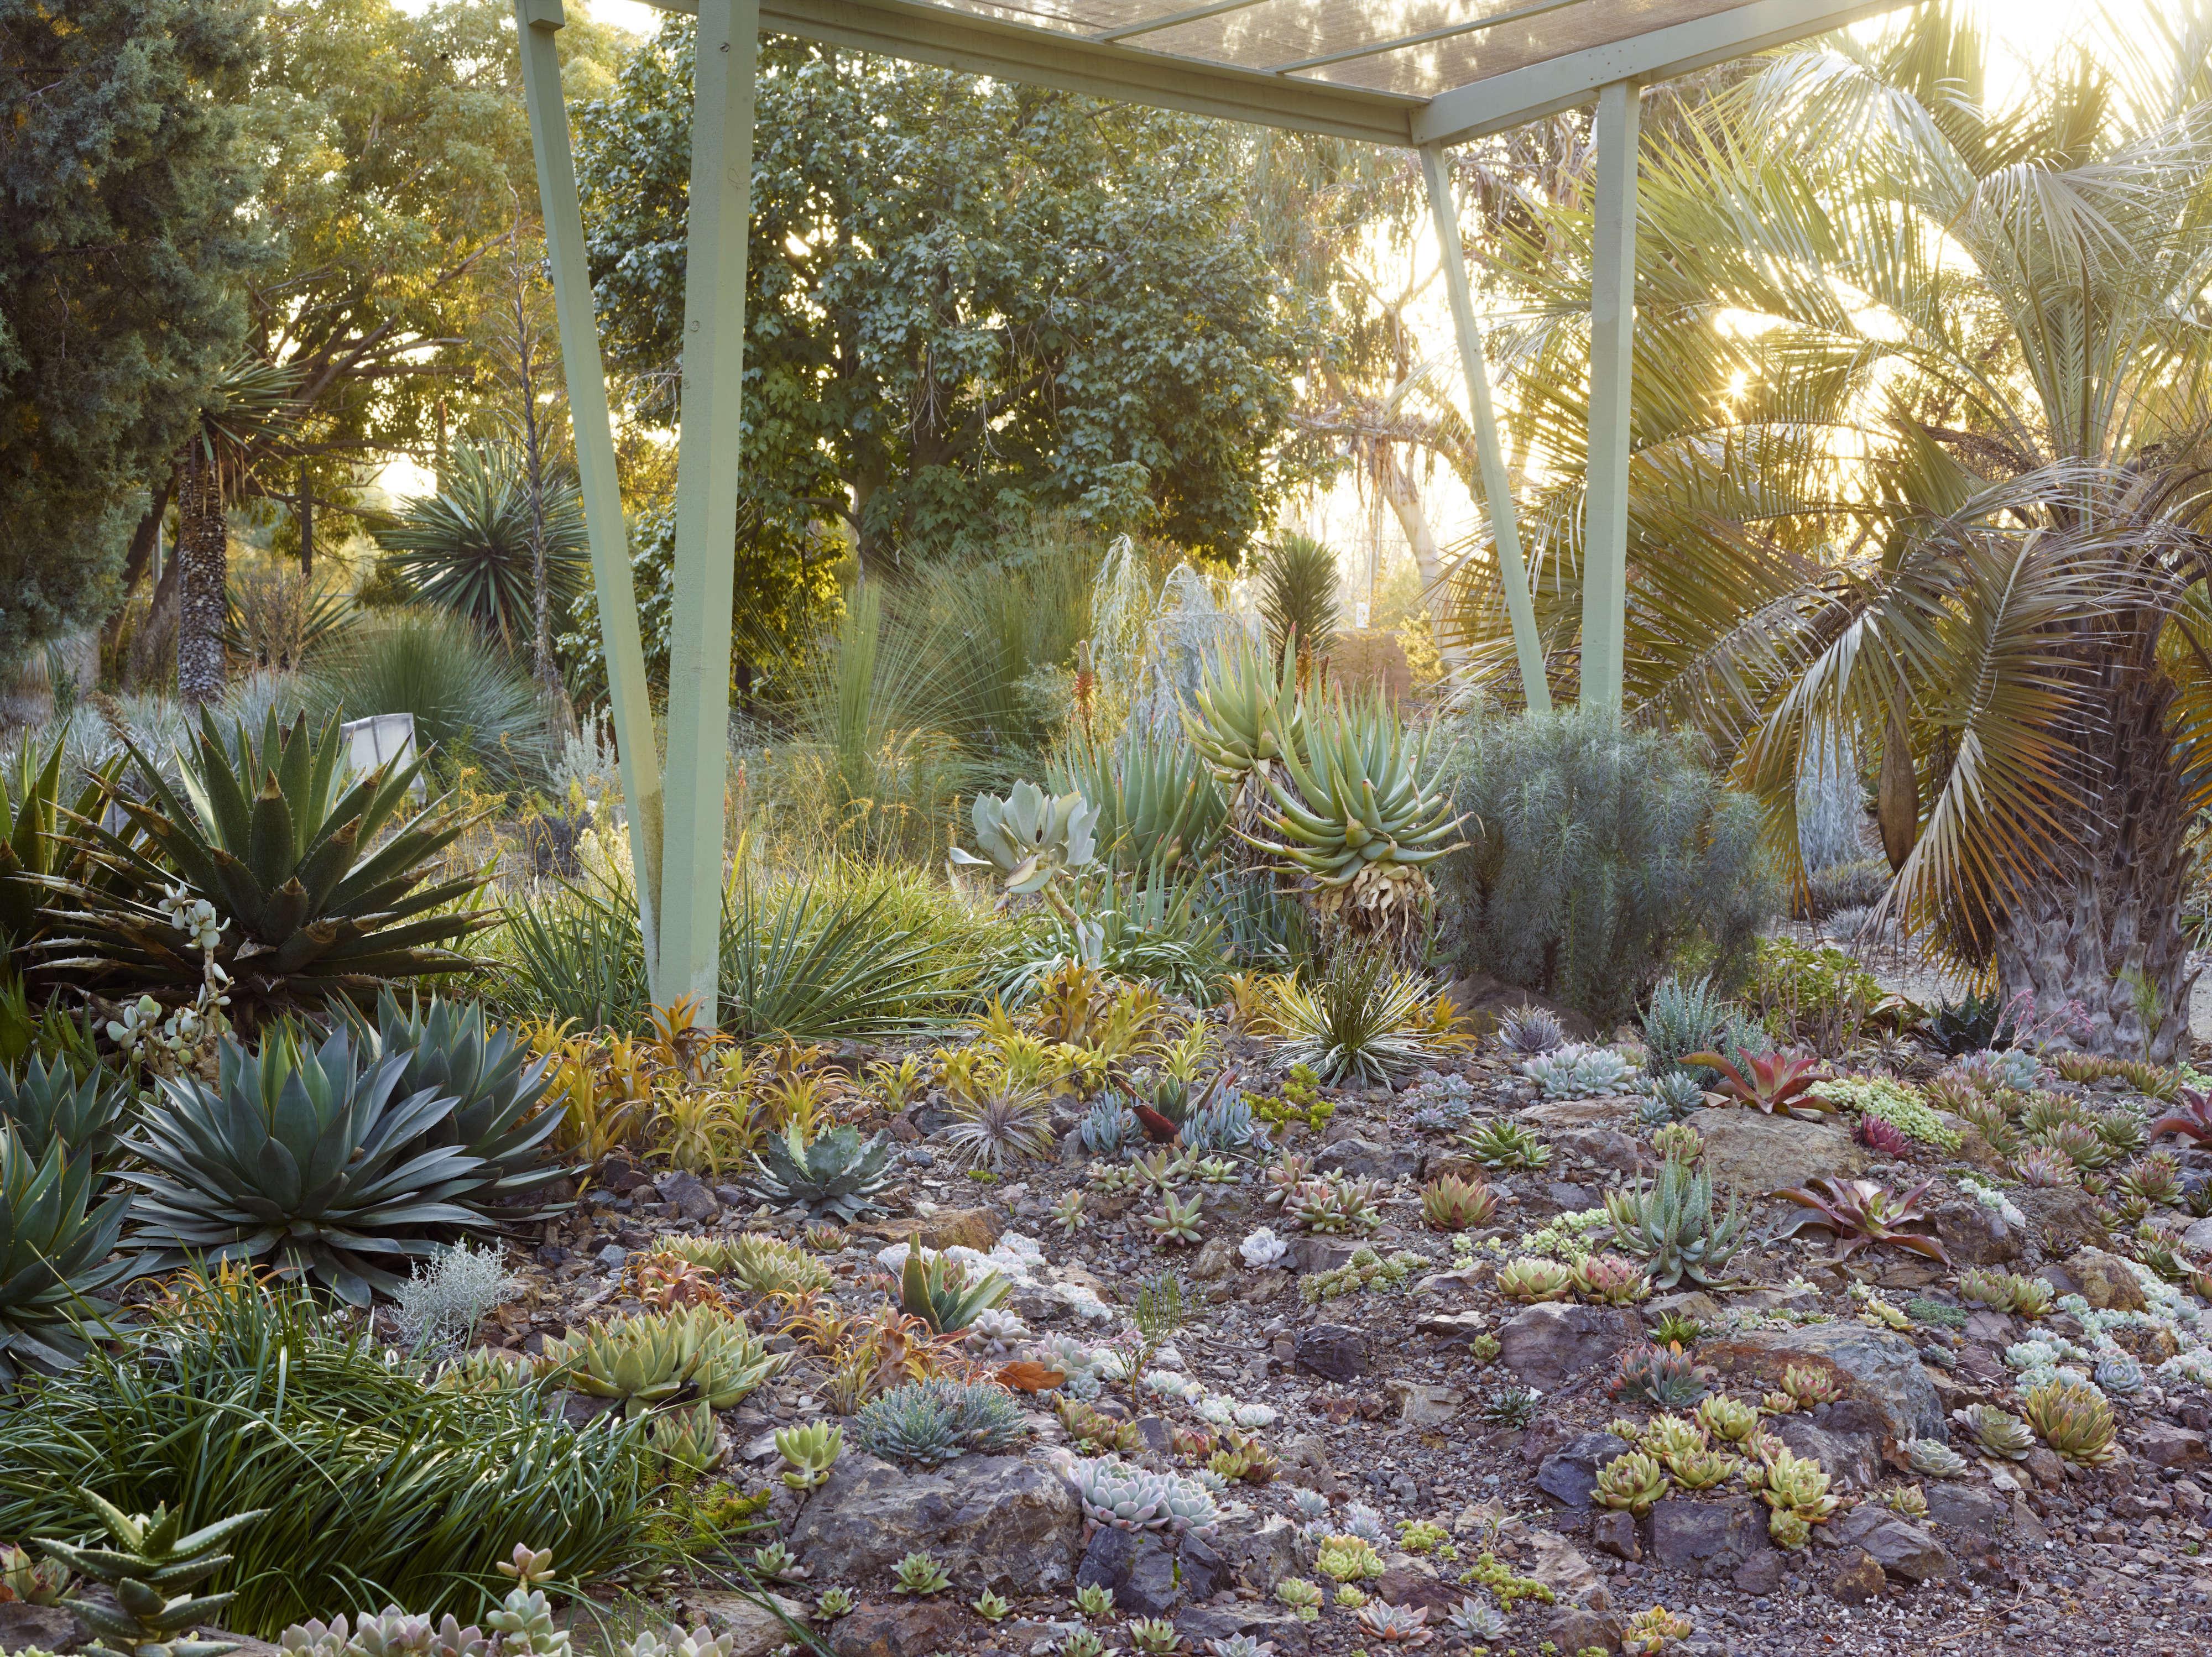 ruth-bancroft-succulents-rock-garden-marion-brenner-dry-bold-garden